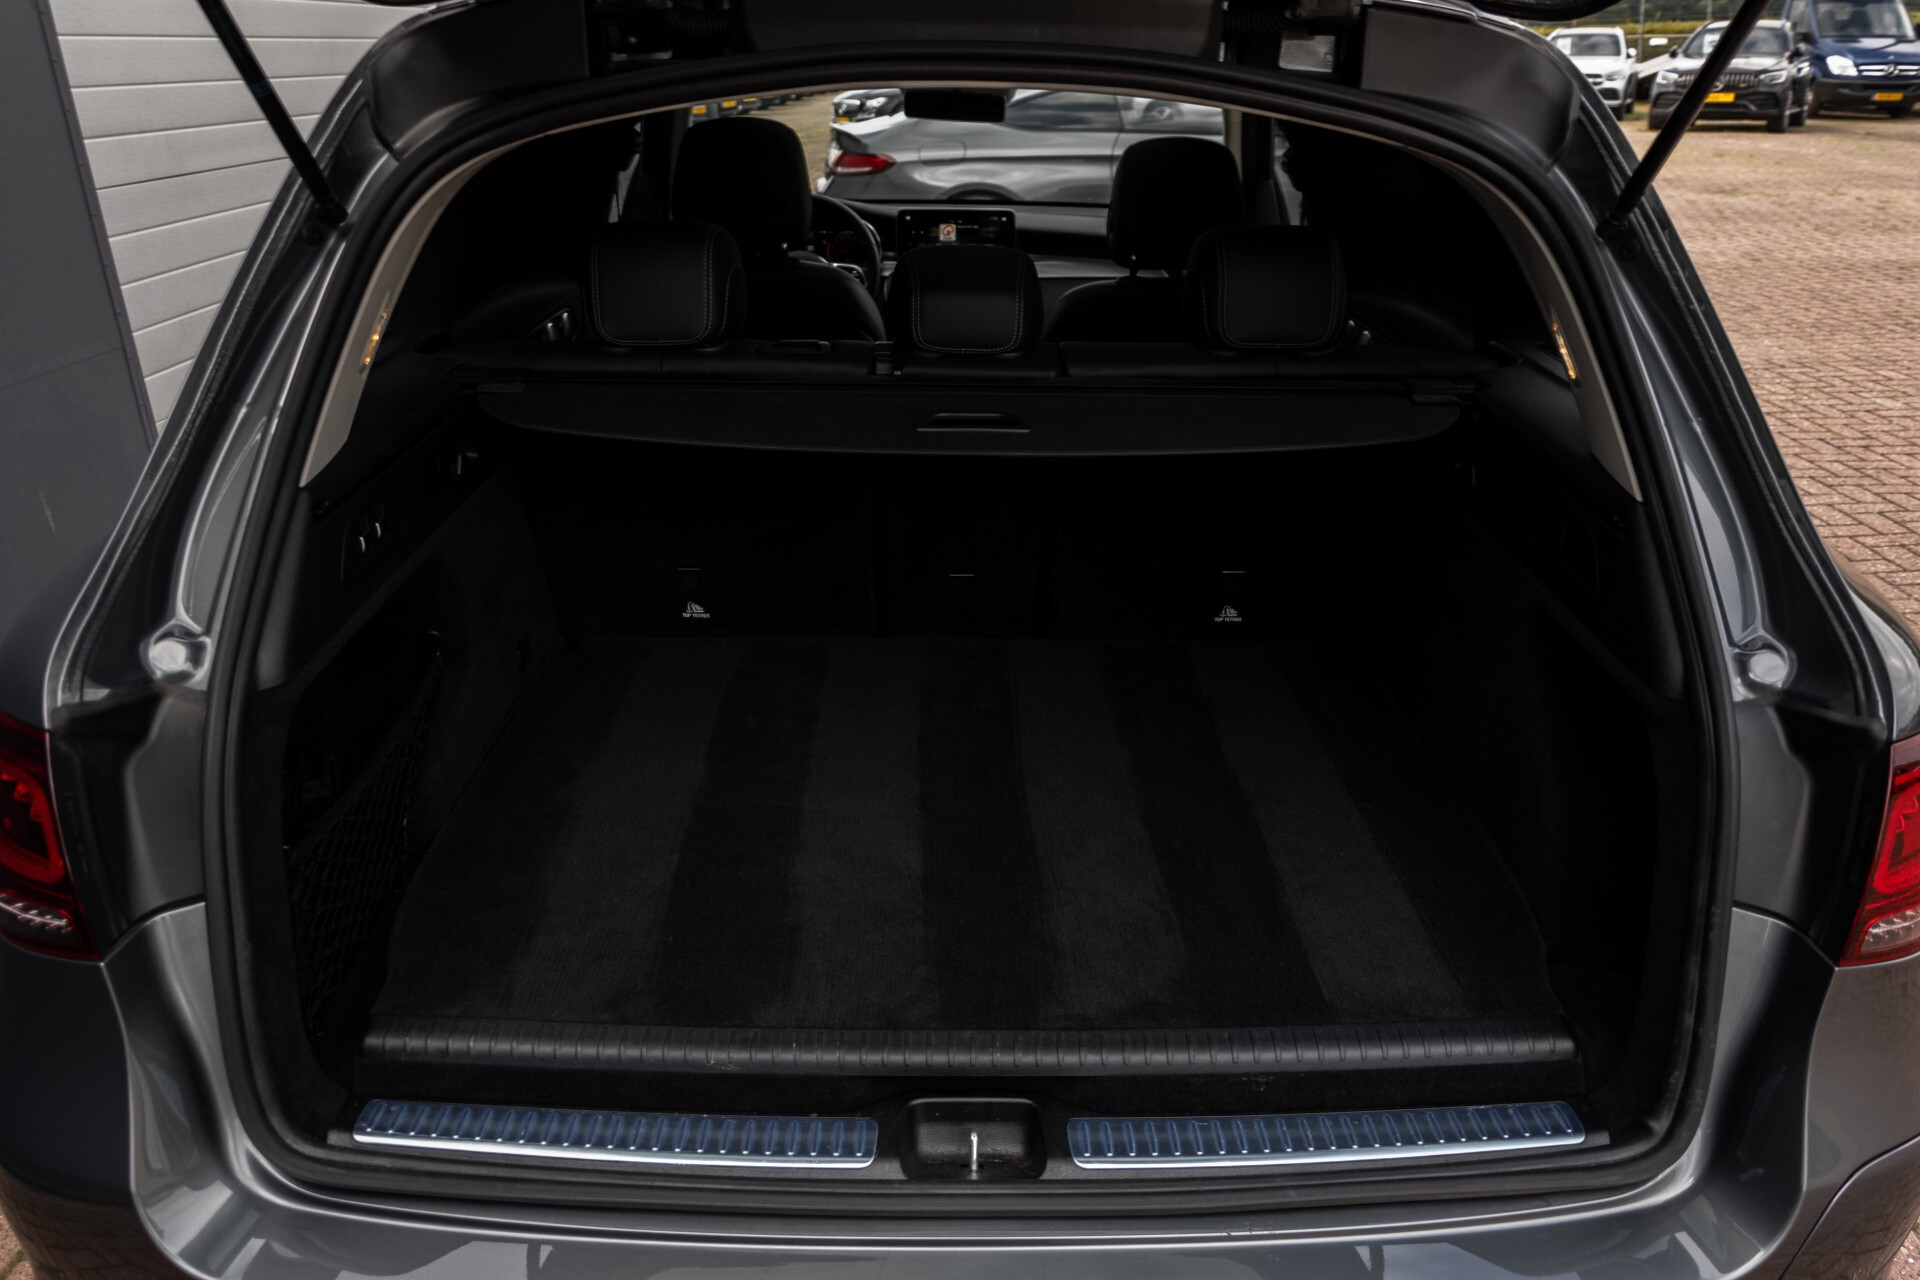 Mercedes-Benz GLC 300e 4-M Luchtvering/Panorama/Multicontourstoelen/Rij-assistentie/Standkachel Aut9 Foto 57